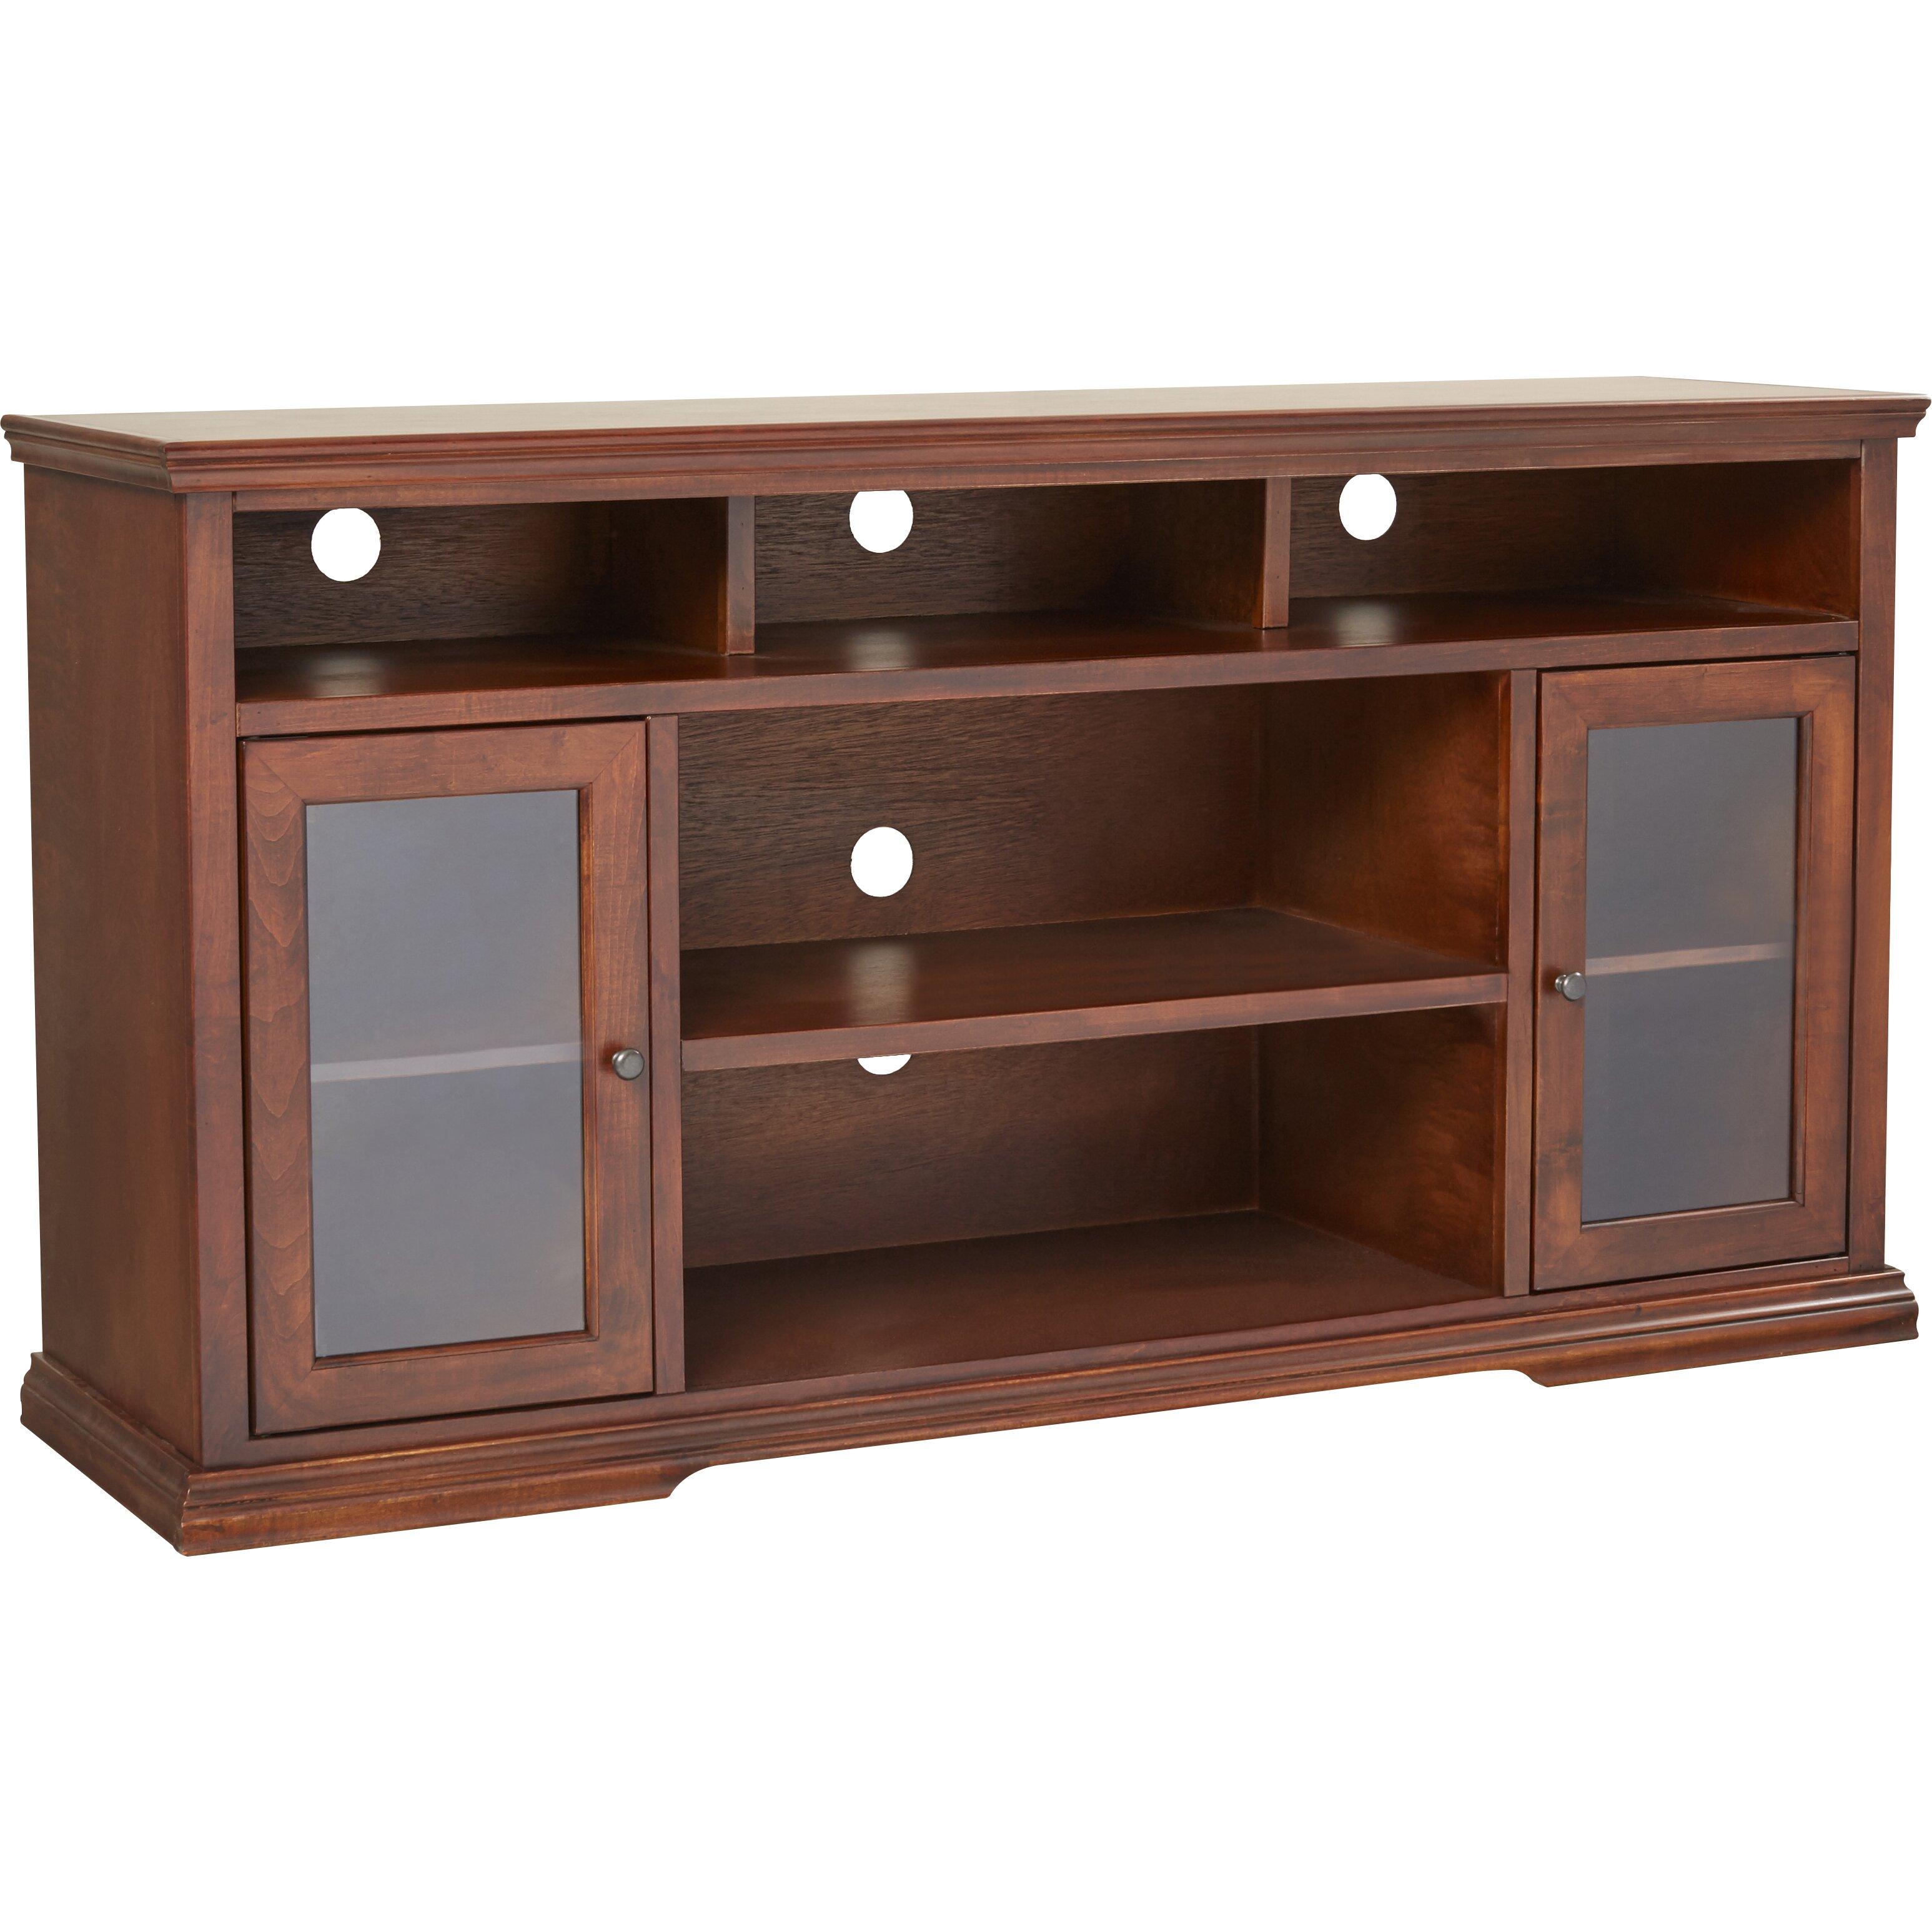 I Keating Furniture Predmore Beige Brown Seat Cushion